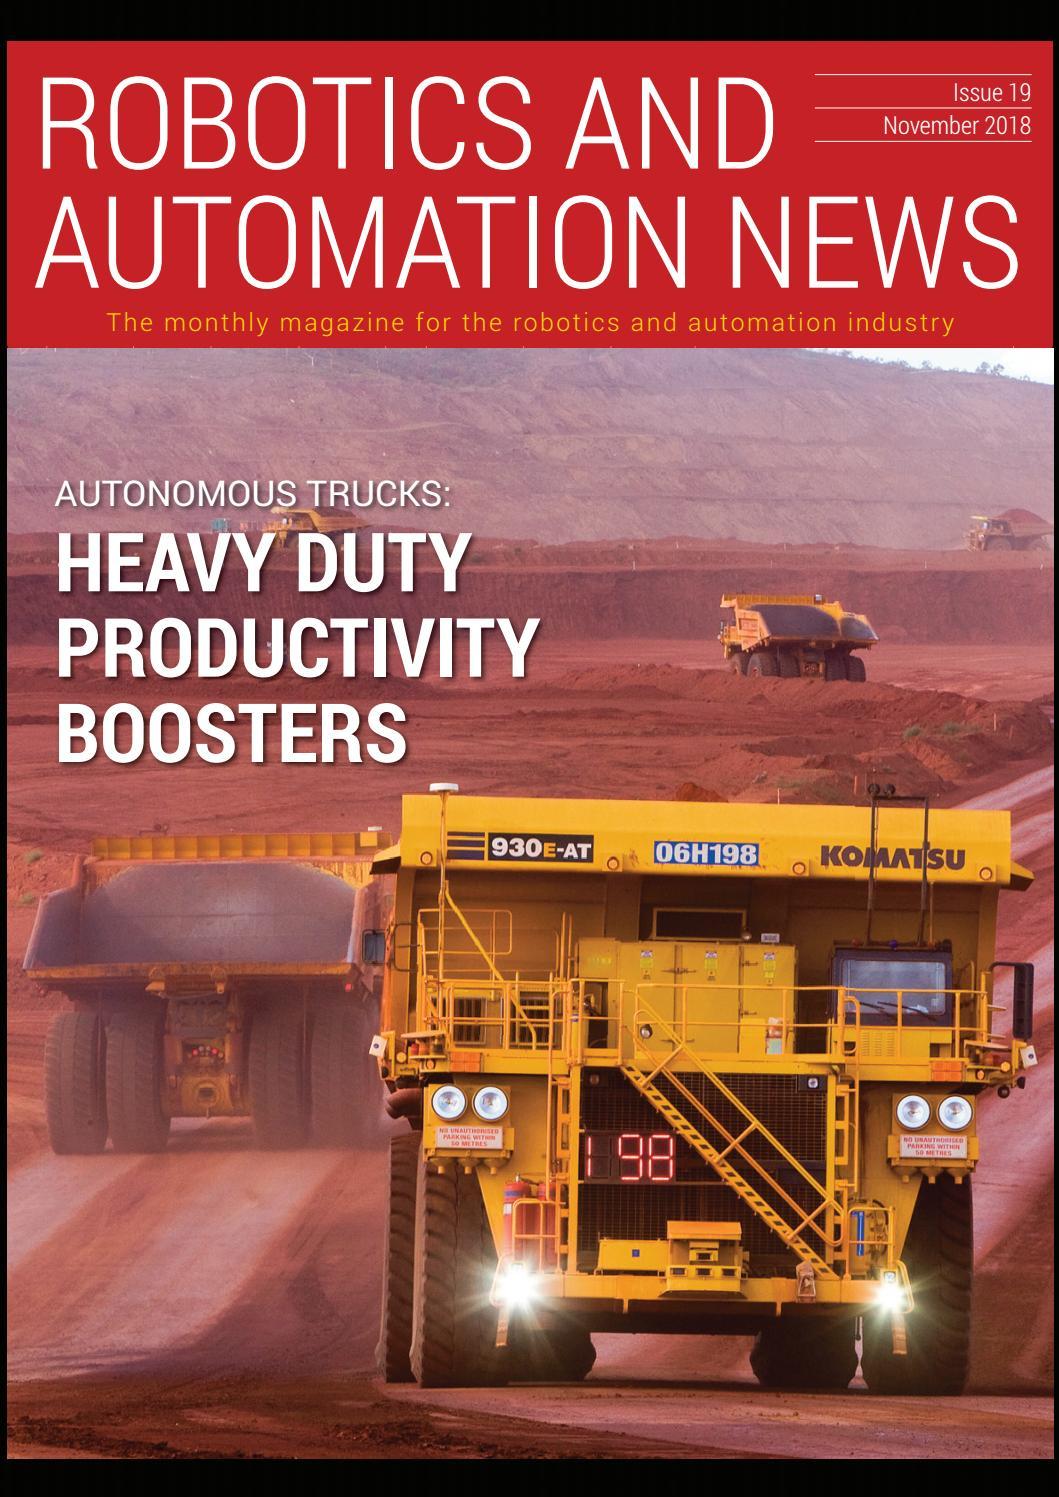 Robotics & Automation News, November 2018 by